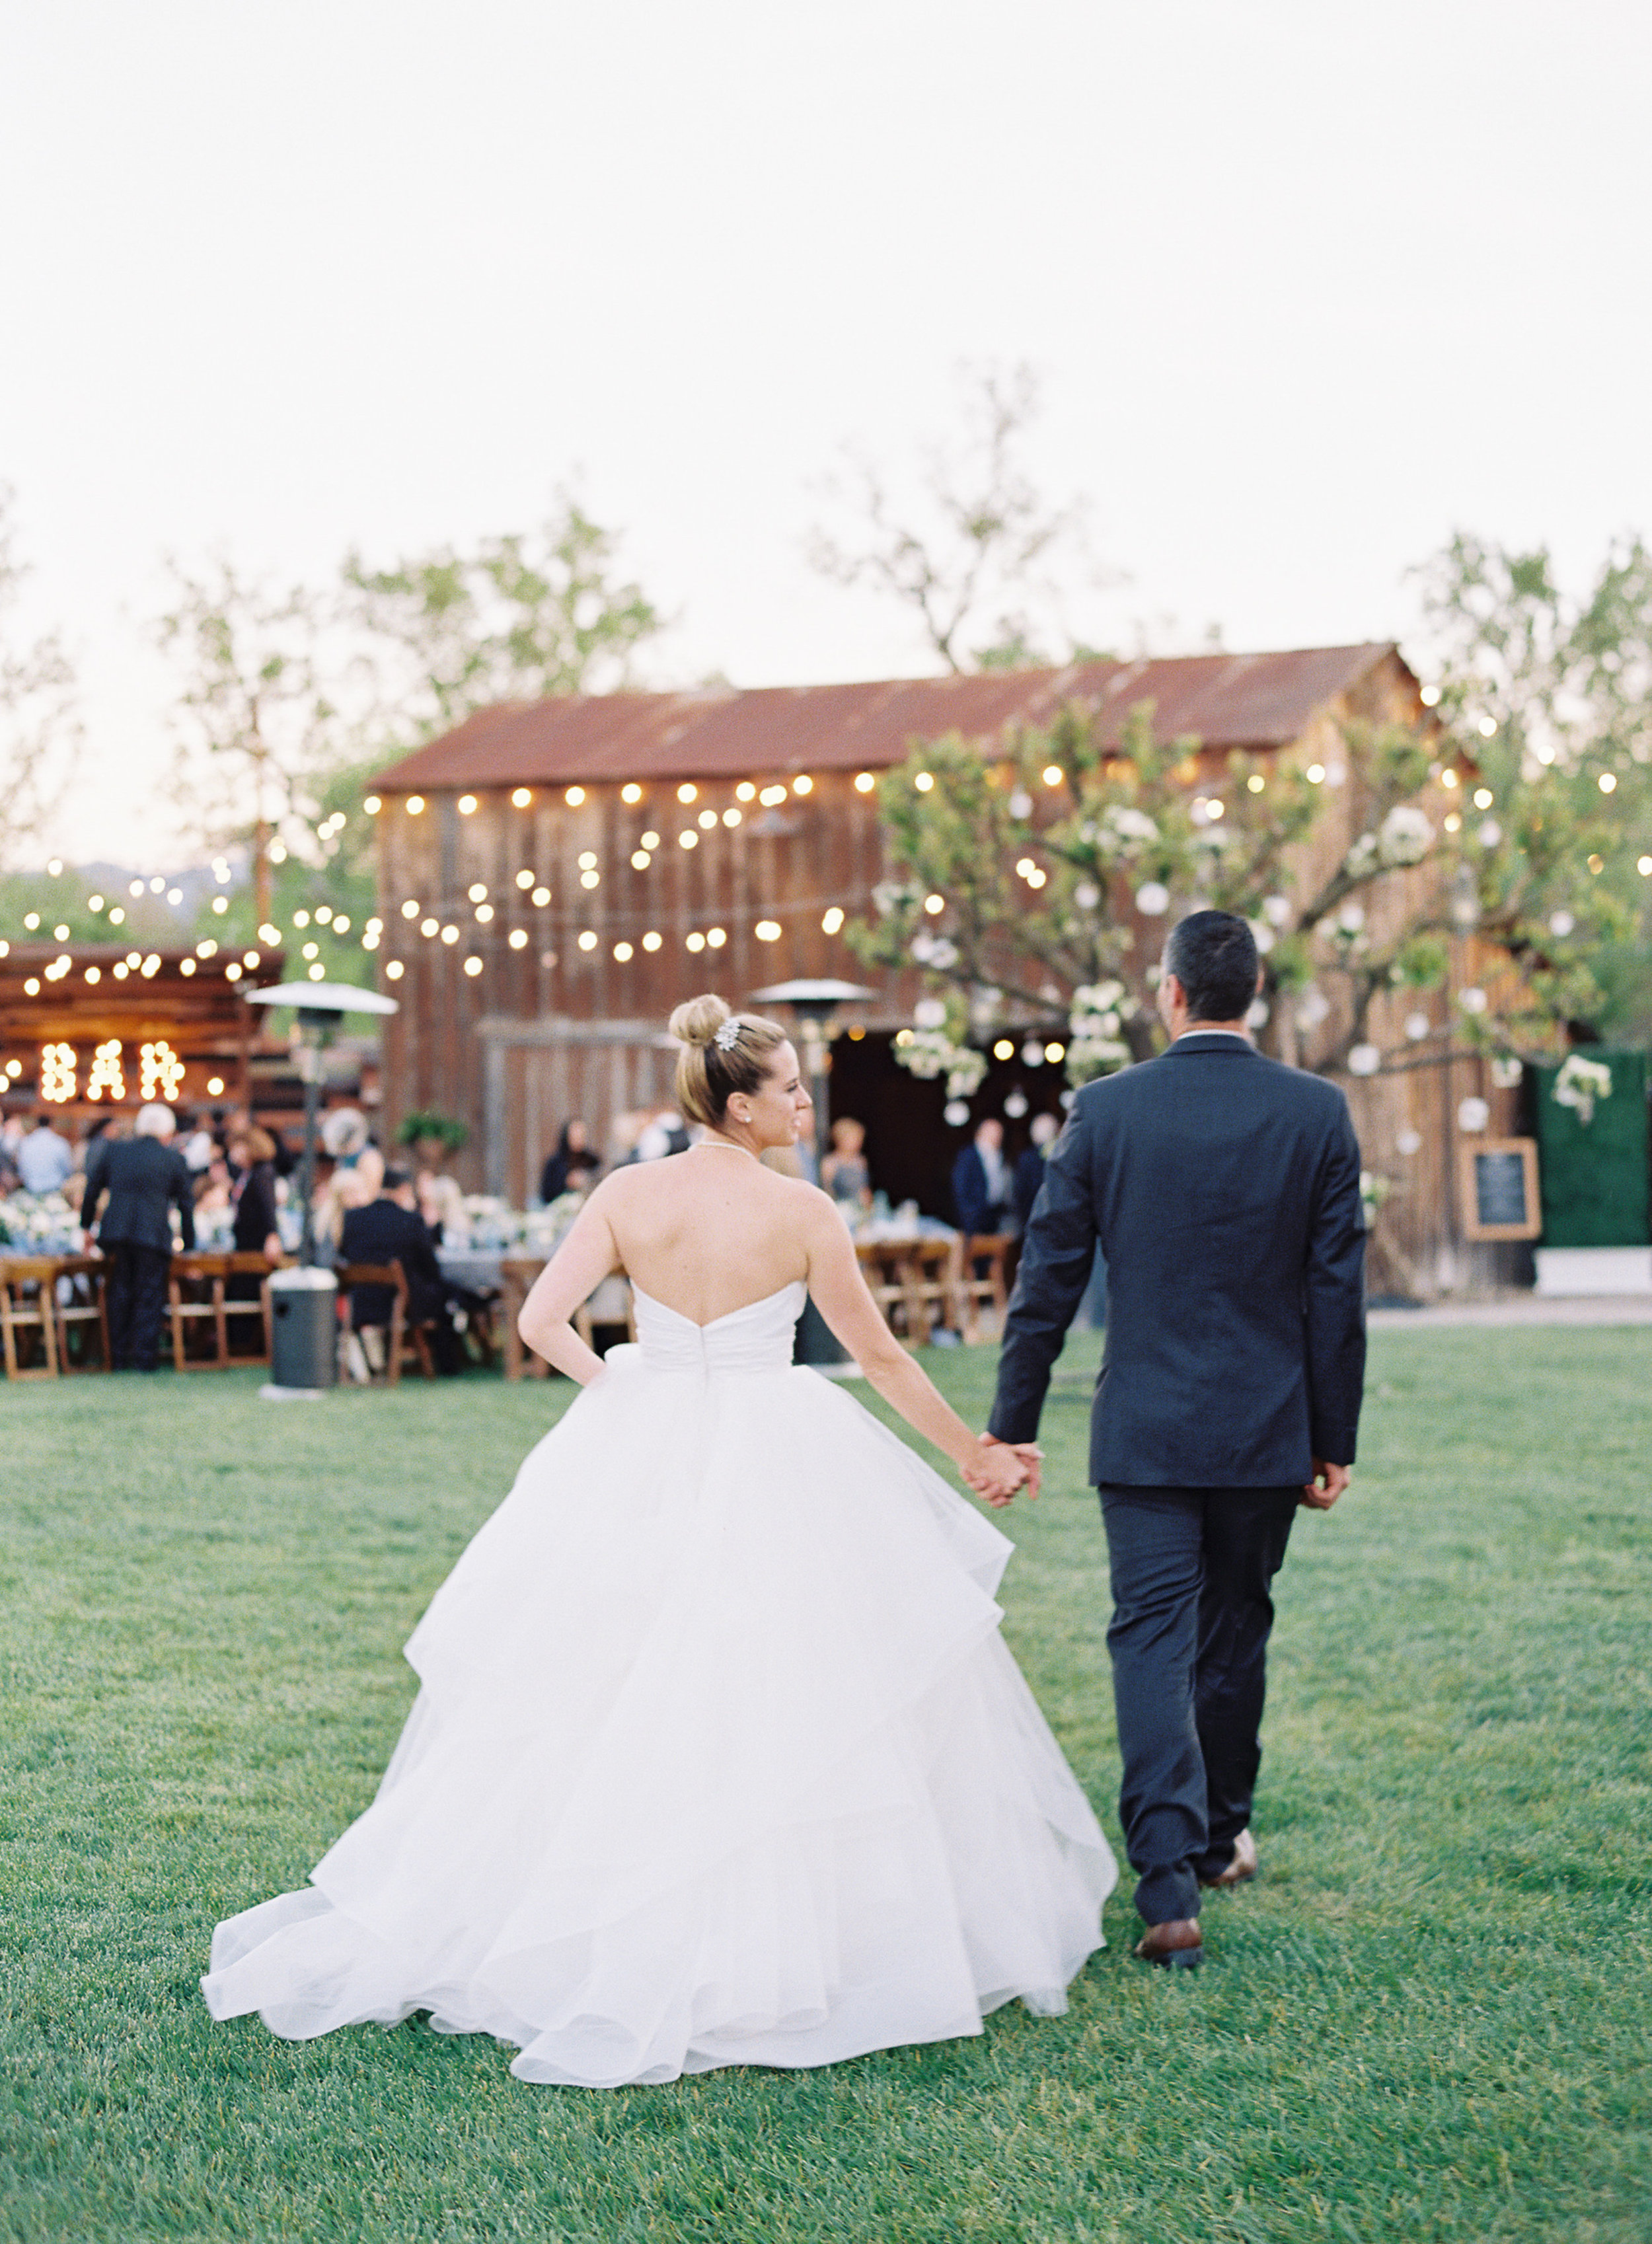 Paso-Robles-Wedding-Steven-Ashley-725.jpg